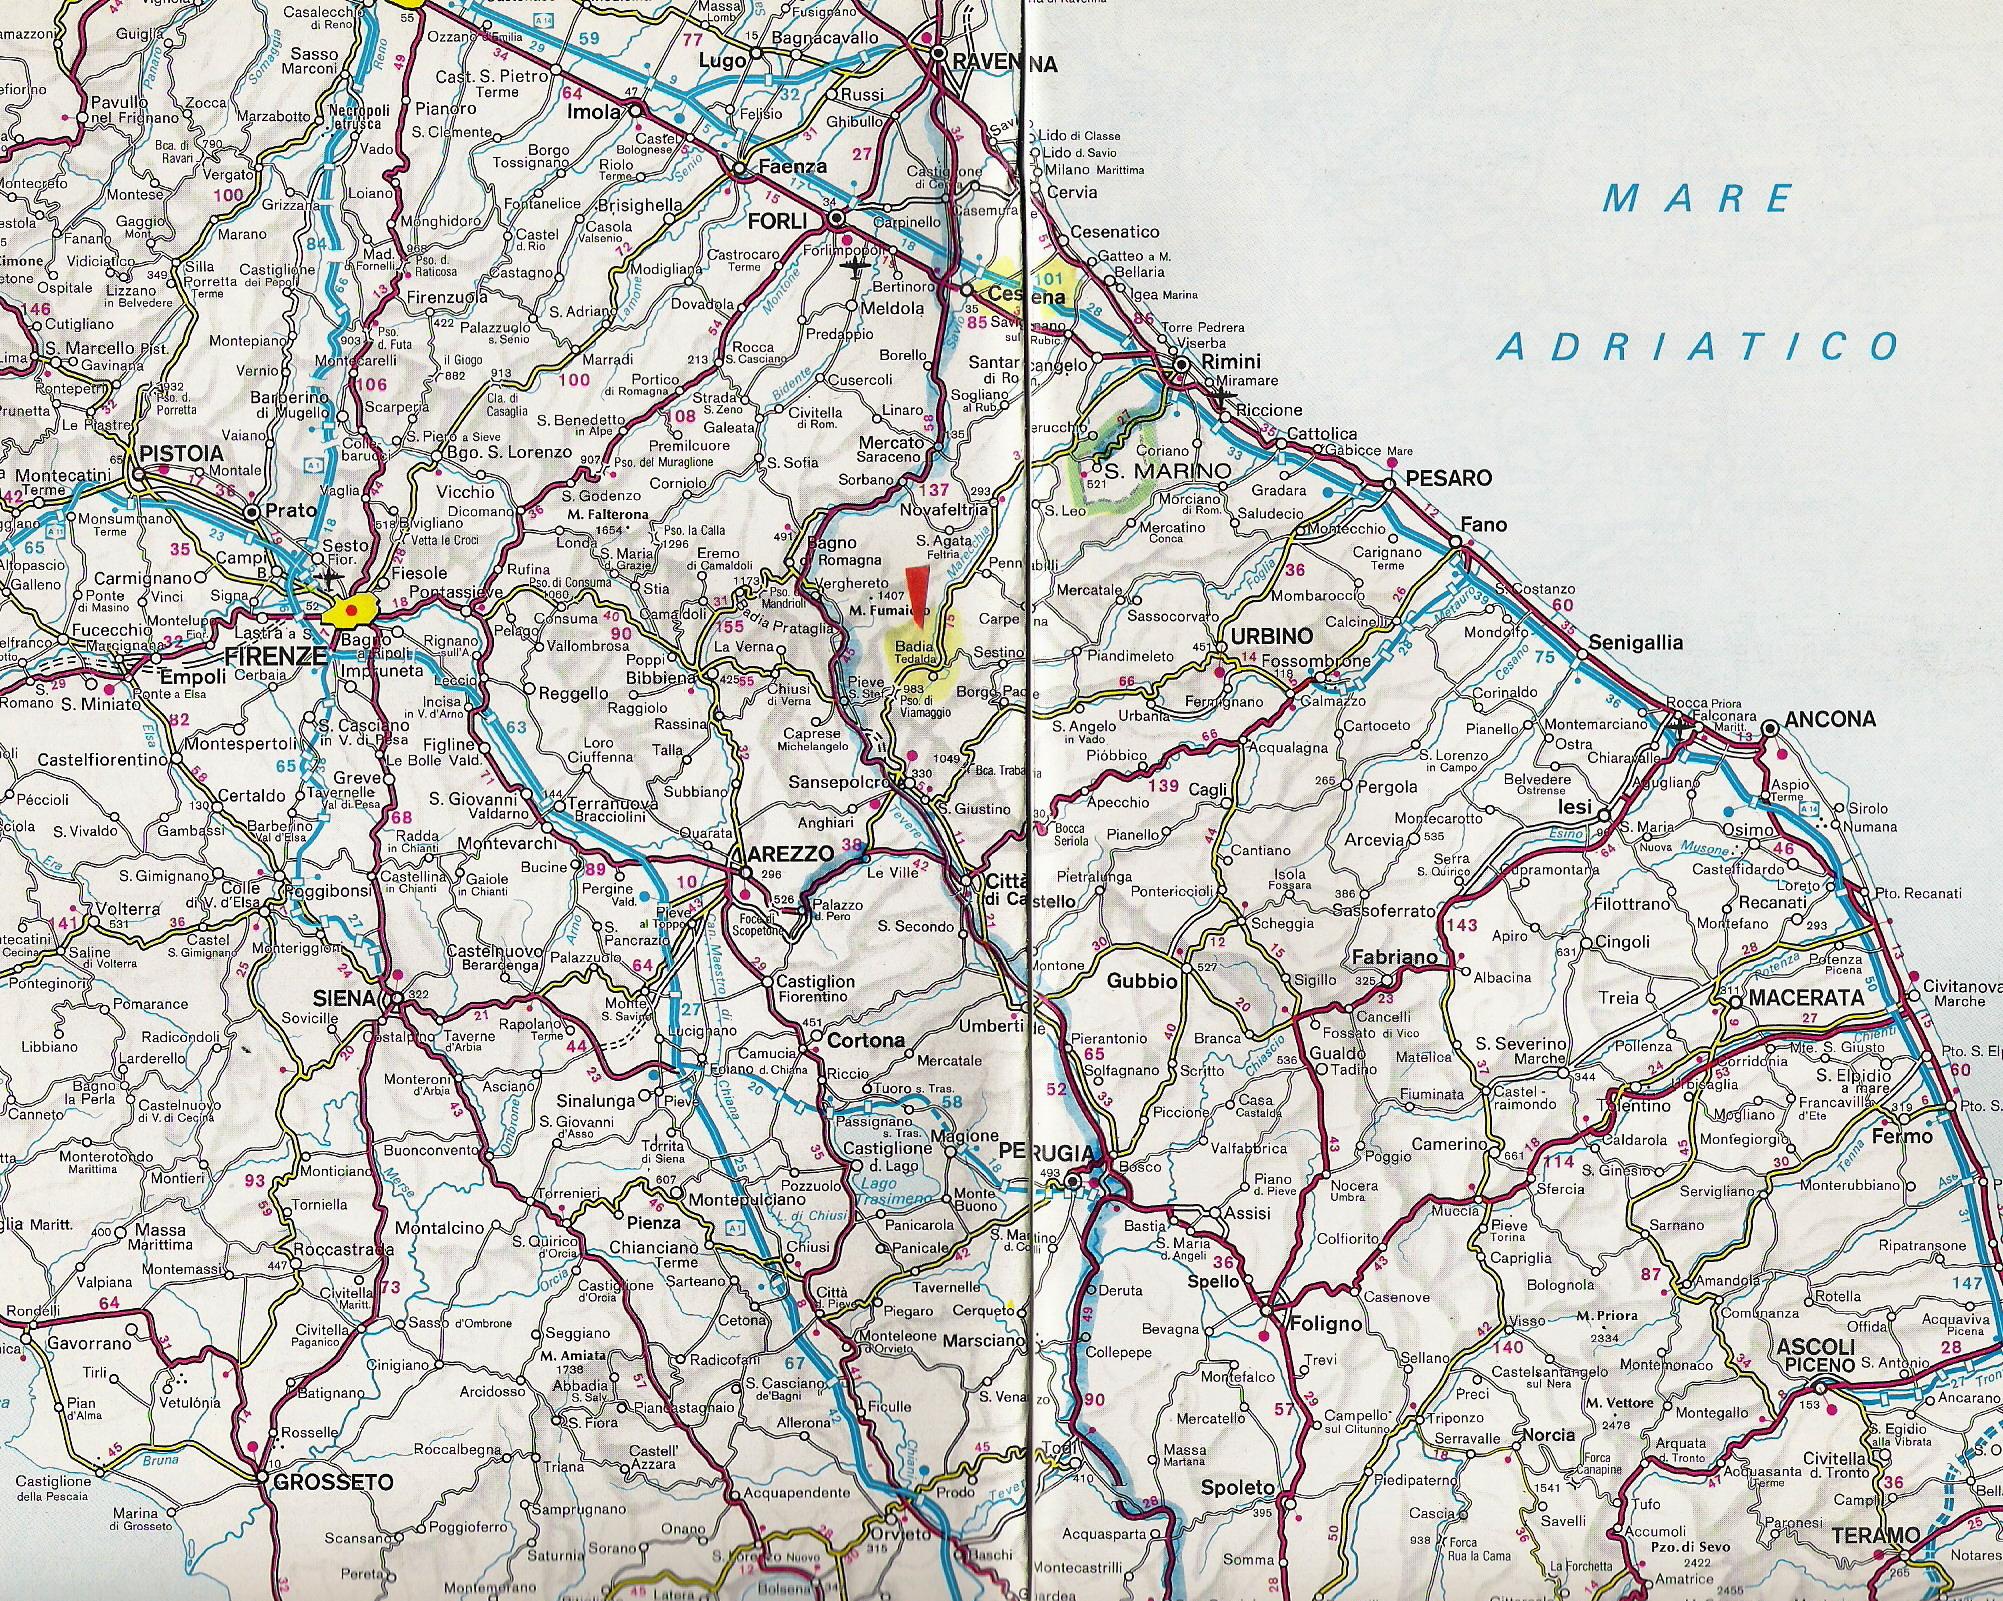 Cartina Stradale Marche Dettagliata.Borgo Ca Valdibrucia Badia Tedalda Ar